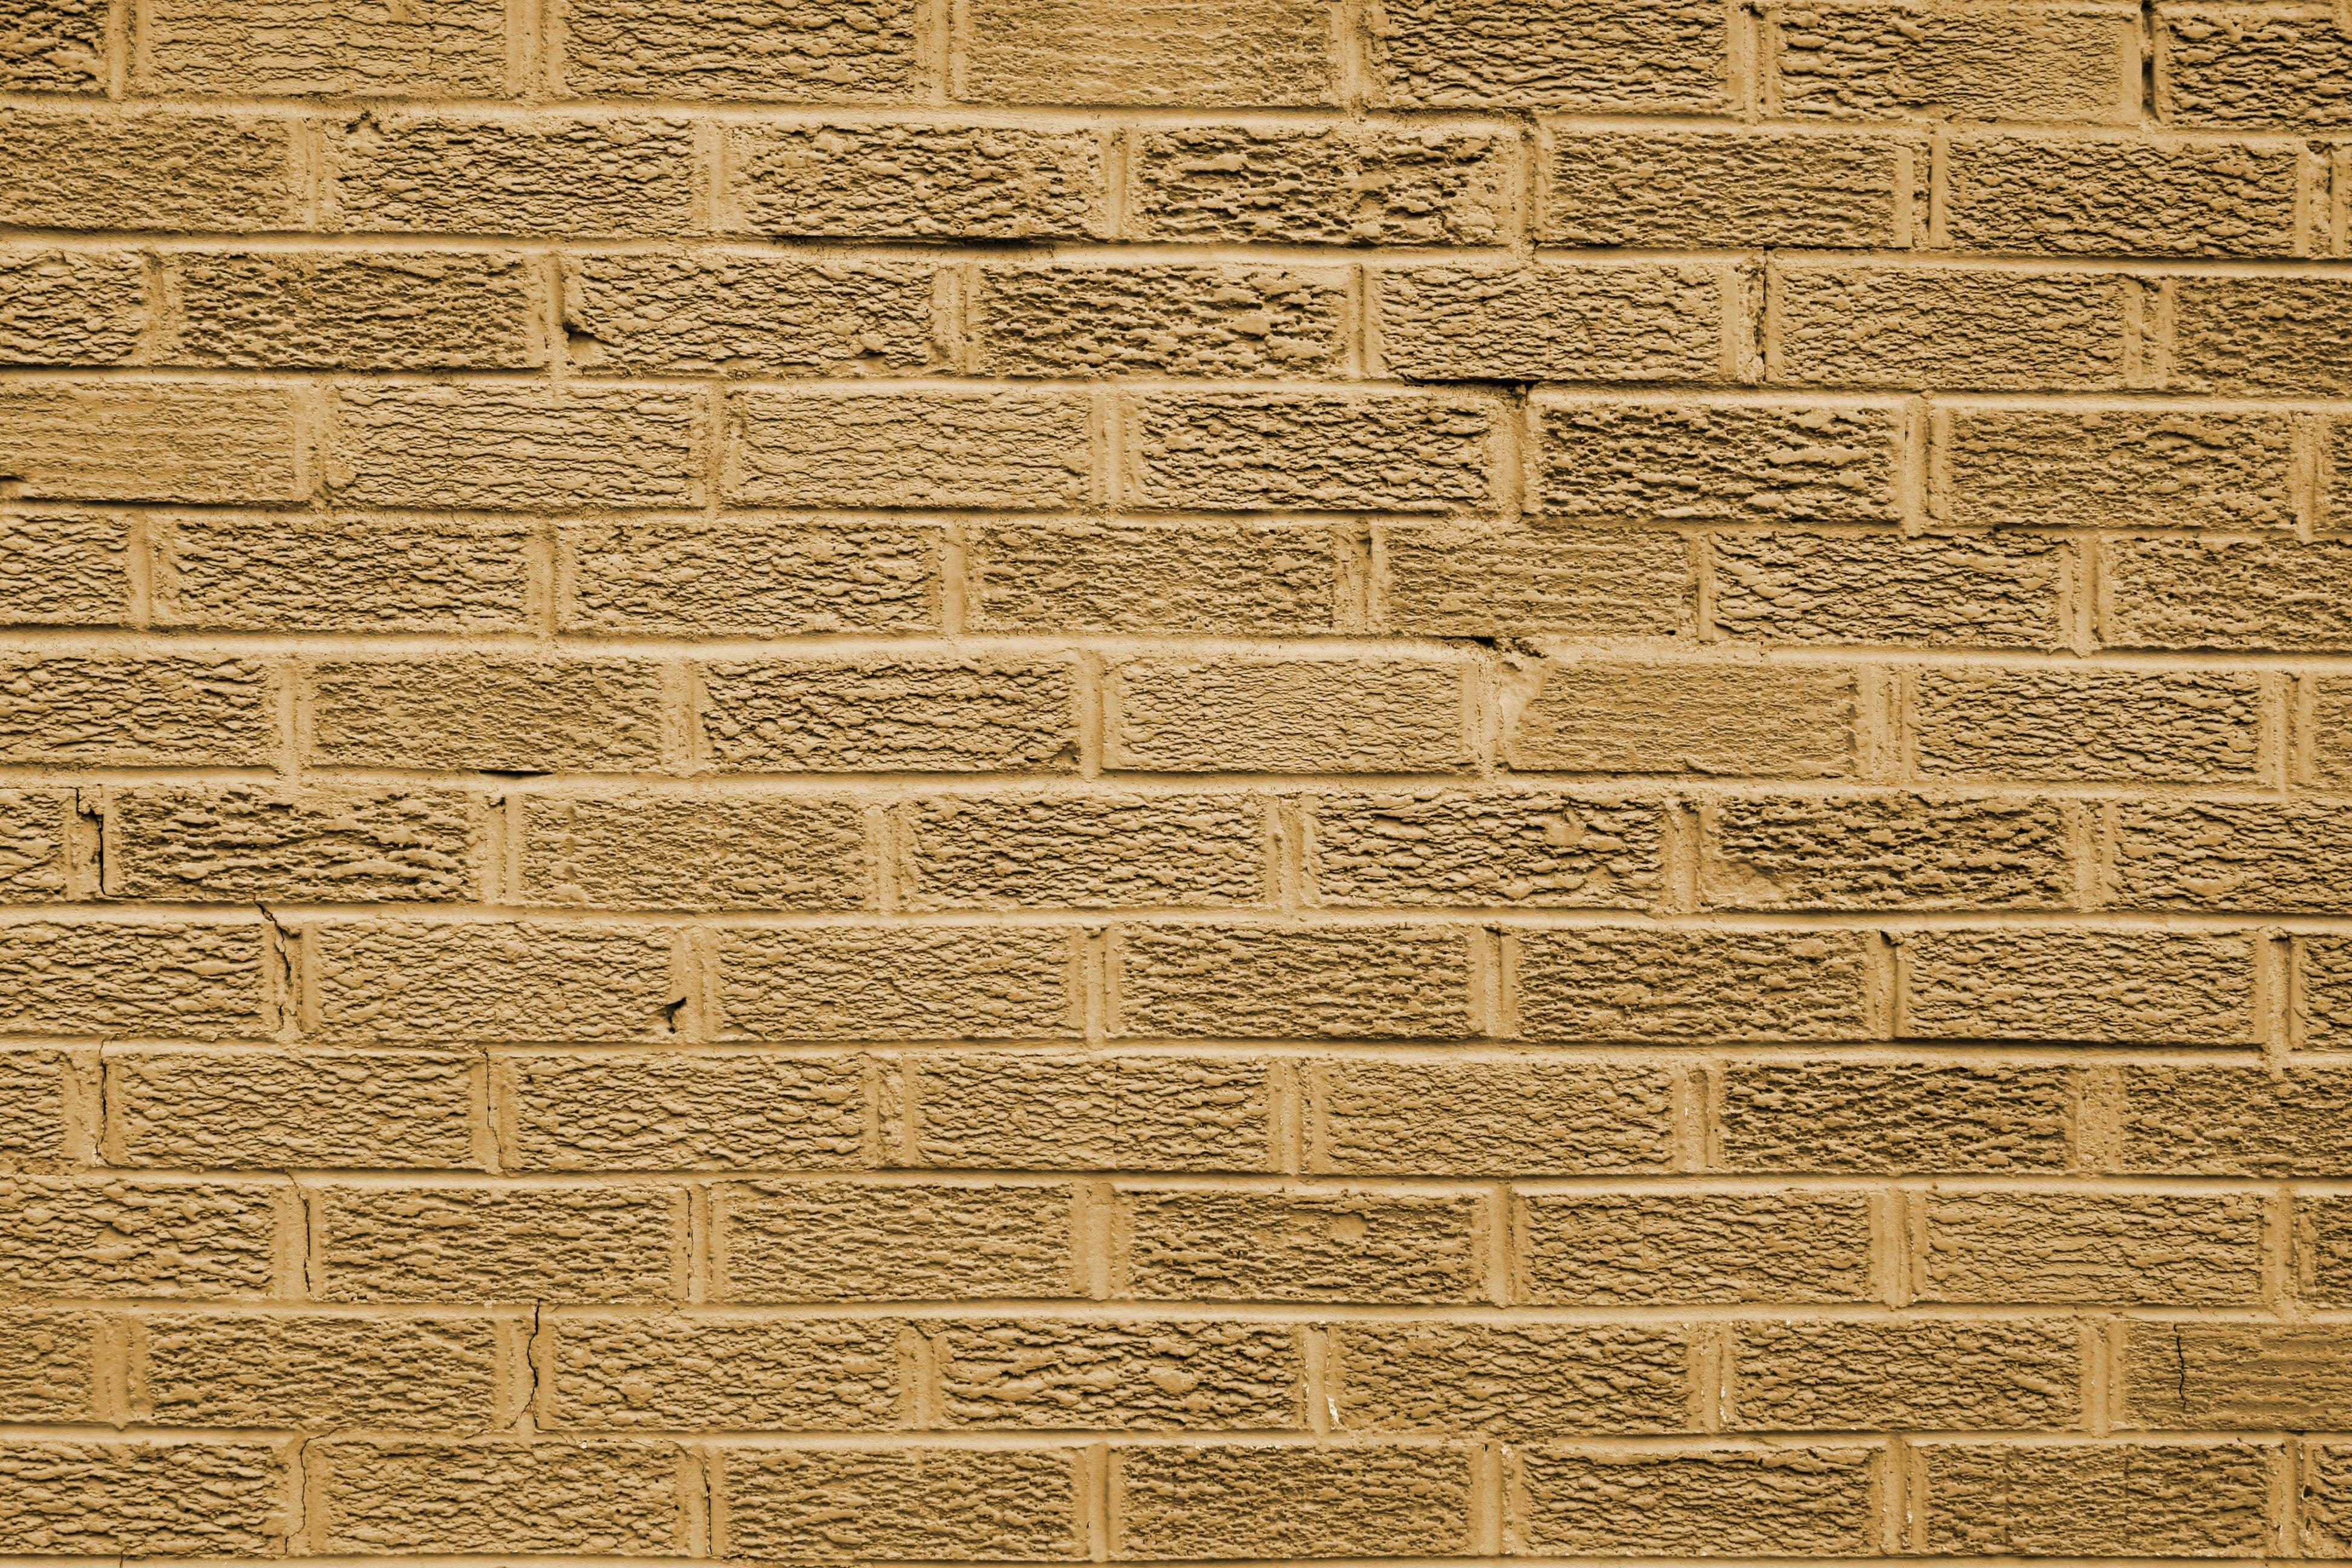 Tan Brick Wall Texture Picture Free Photograph Photos